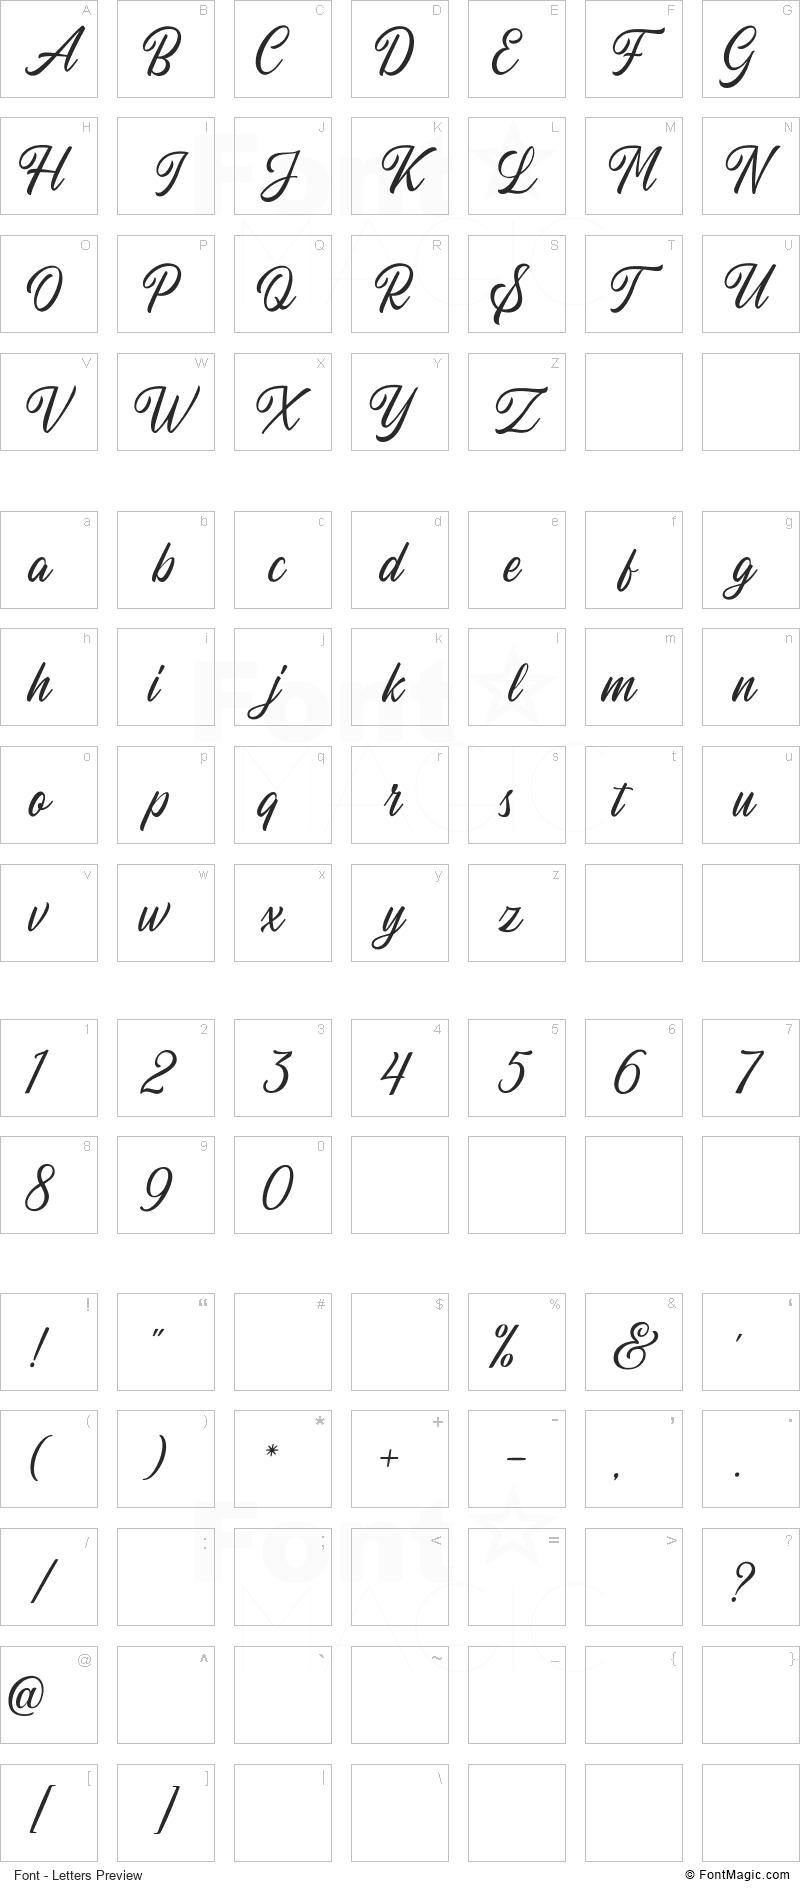 Autogate Font - All Latters Preview Chart